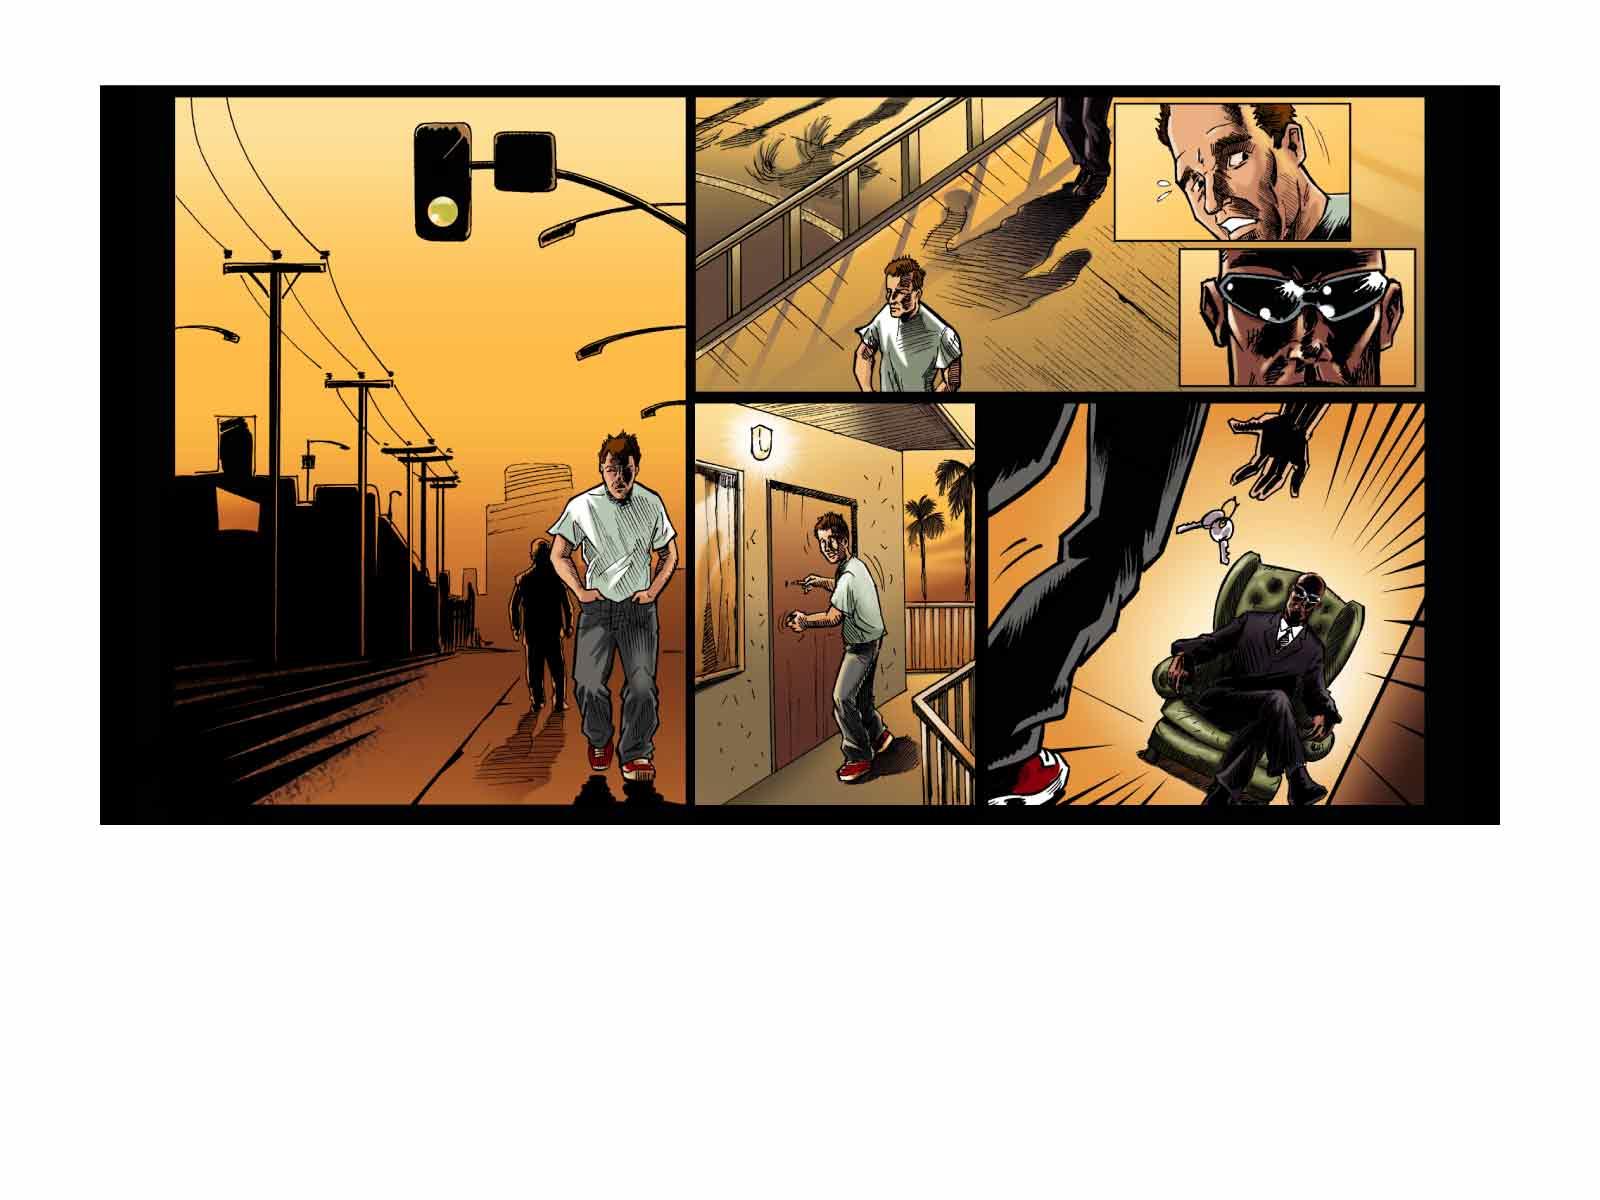 BEAUDENONThierry-Illustrations-STUDIO BD-233